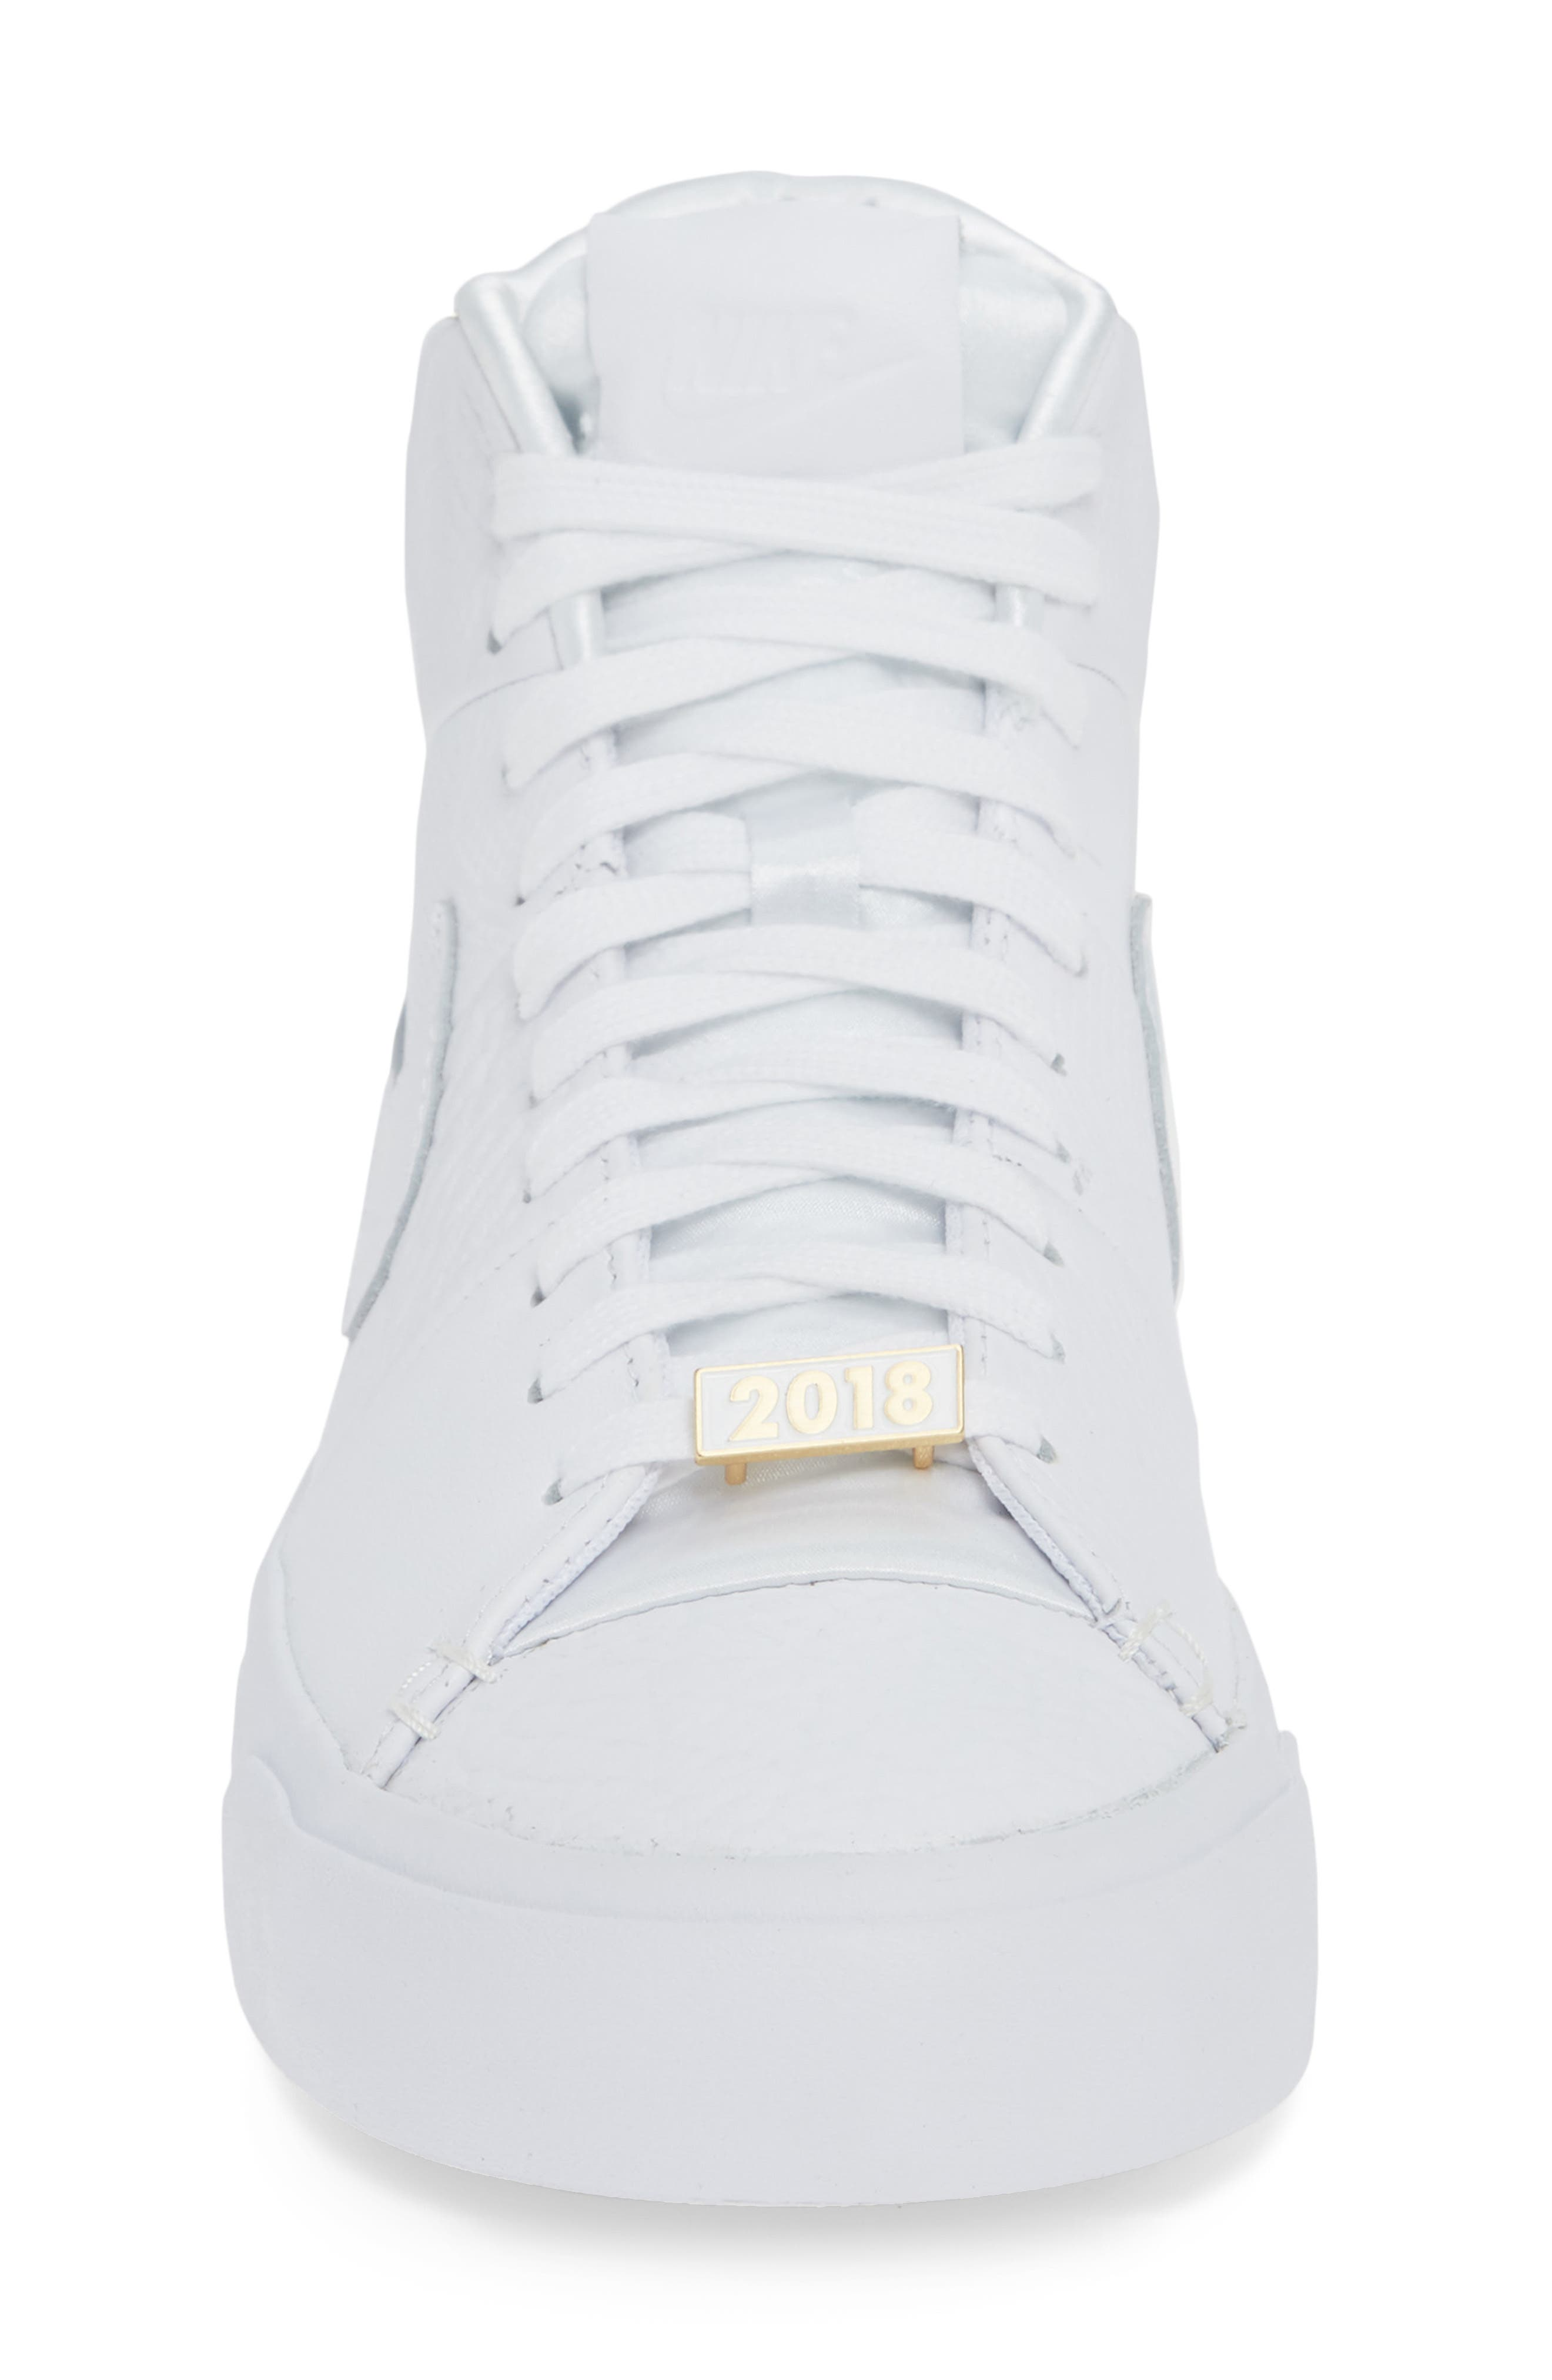 Blazer Royal QS High Top Sneaker,                             Alternate thumbnail 4, color,                             WHITE/ WHITE/ WHITE